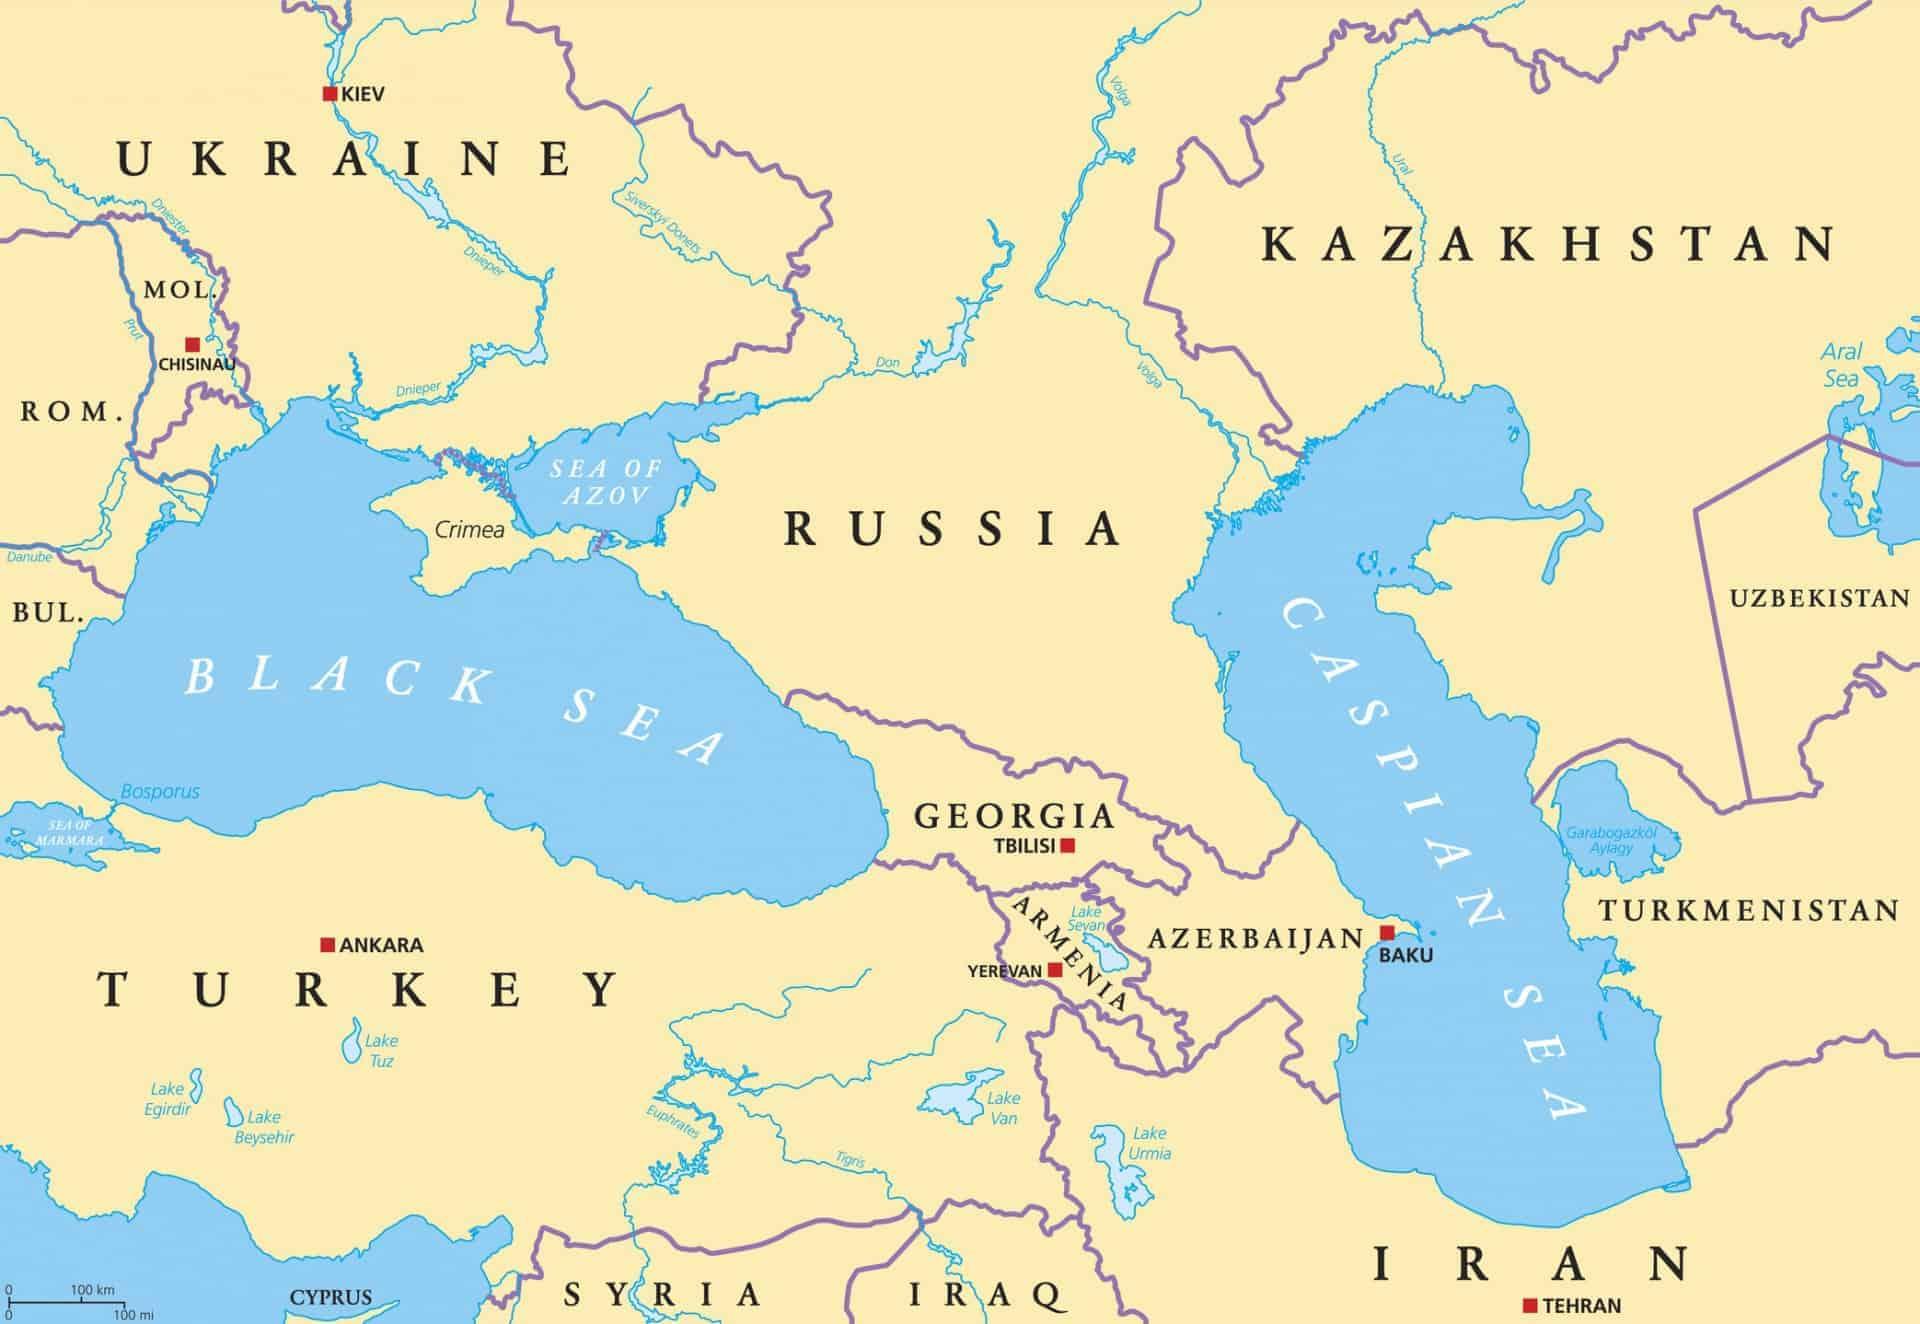 Image of: Armenia Azerbaijan Georgia The Caucasus Odyssey Traveller Tour